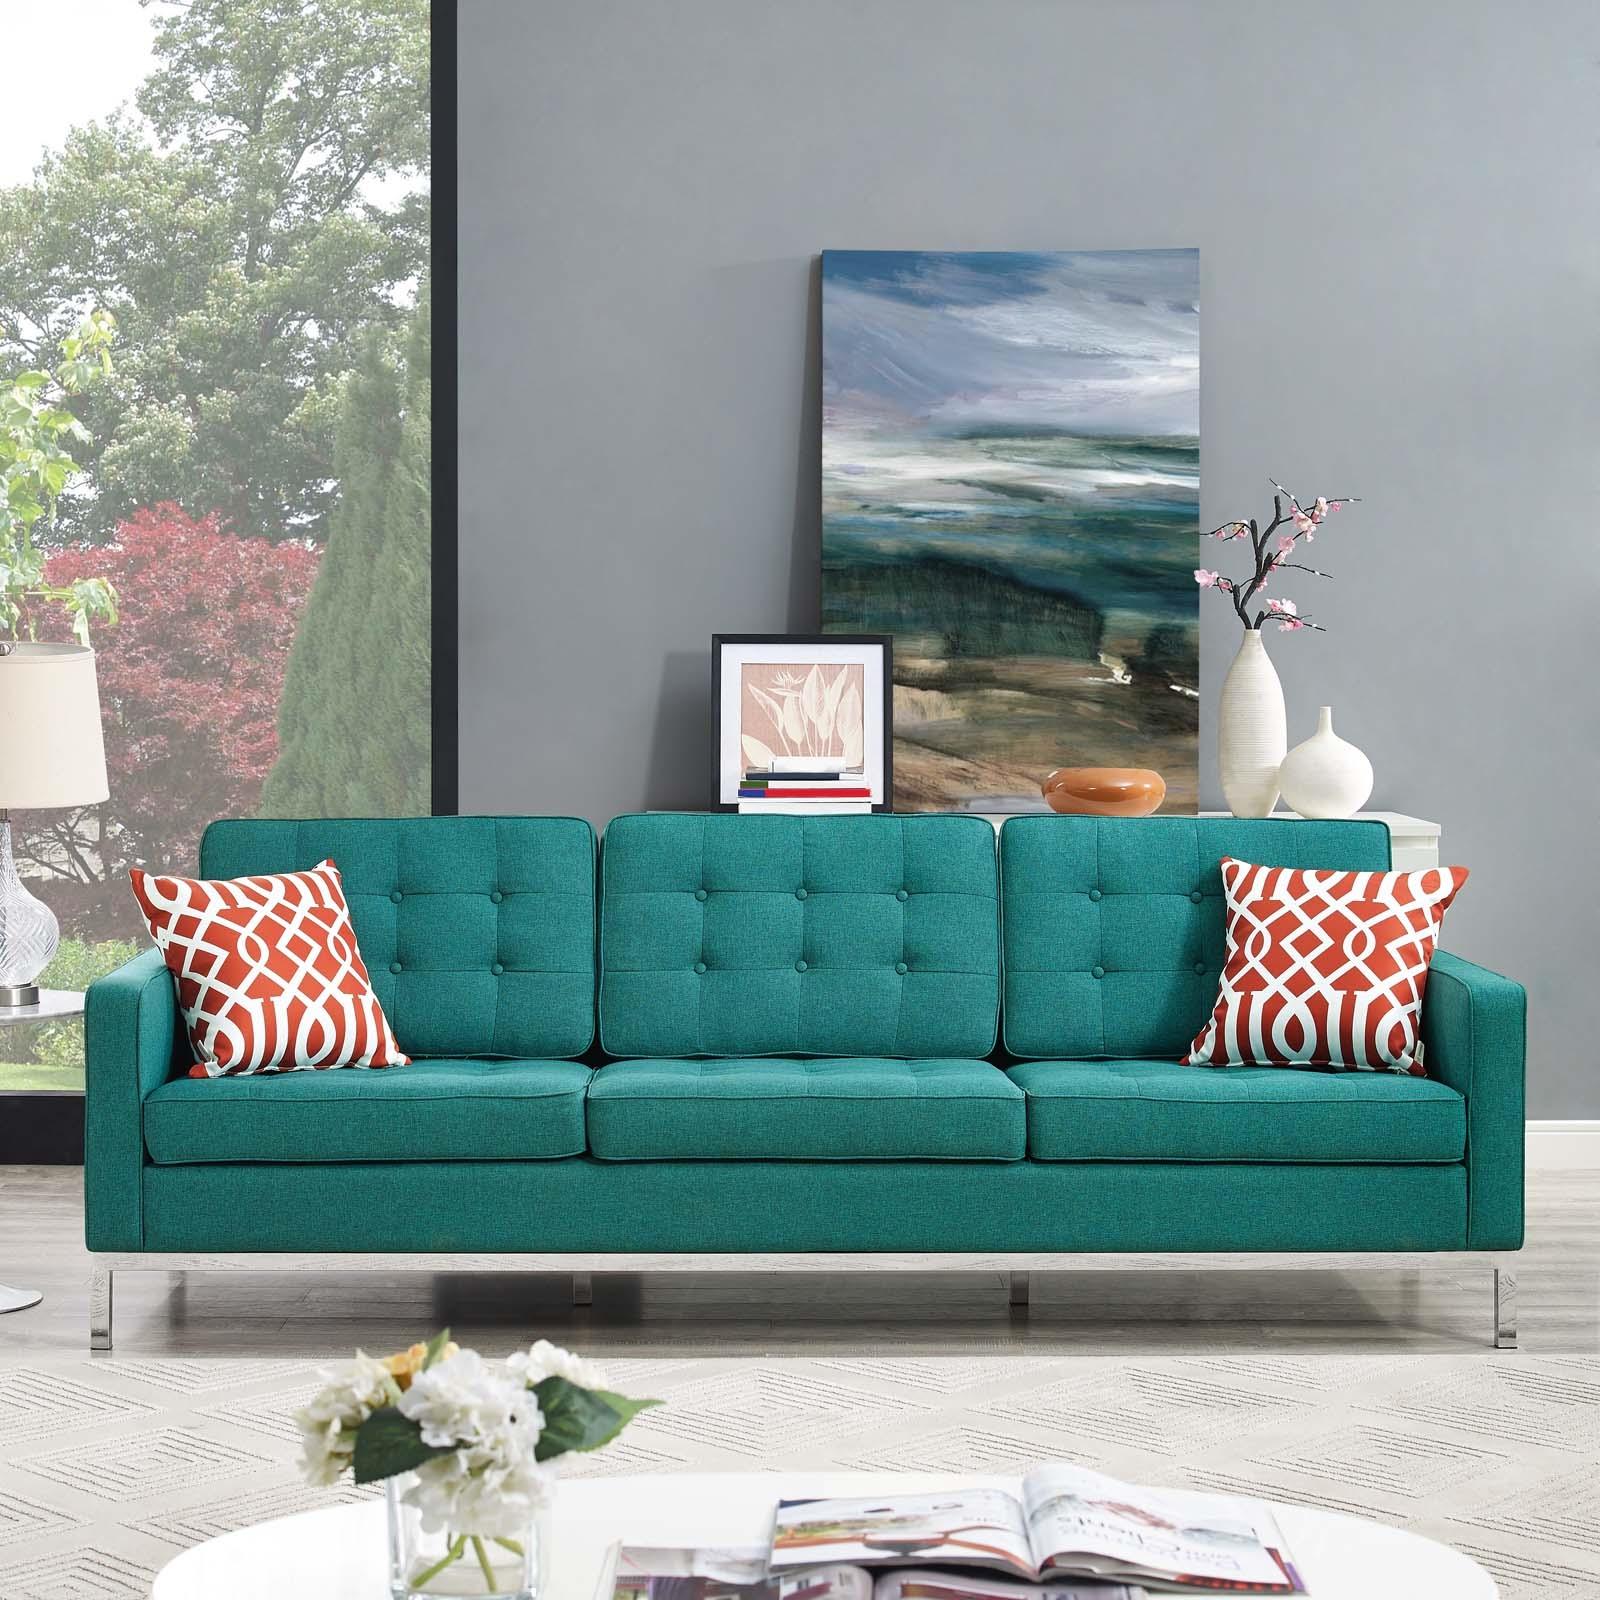 Loft Teal Upholstered Fabric Sofa Las Vegas Furniture